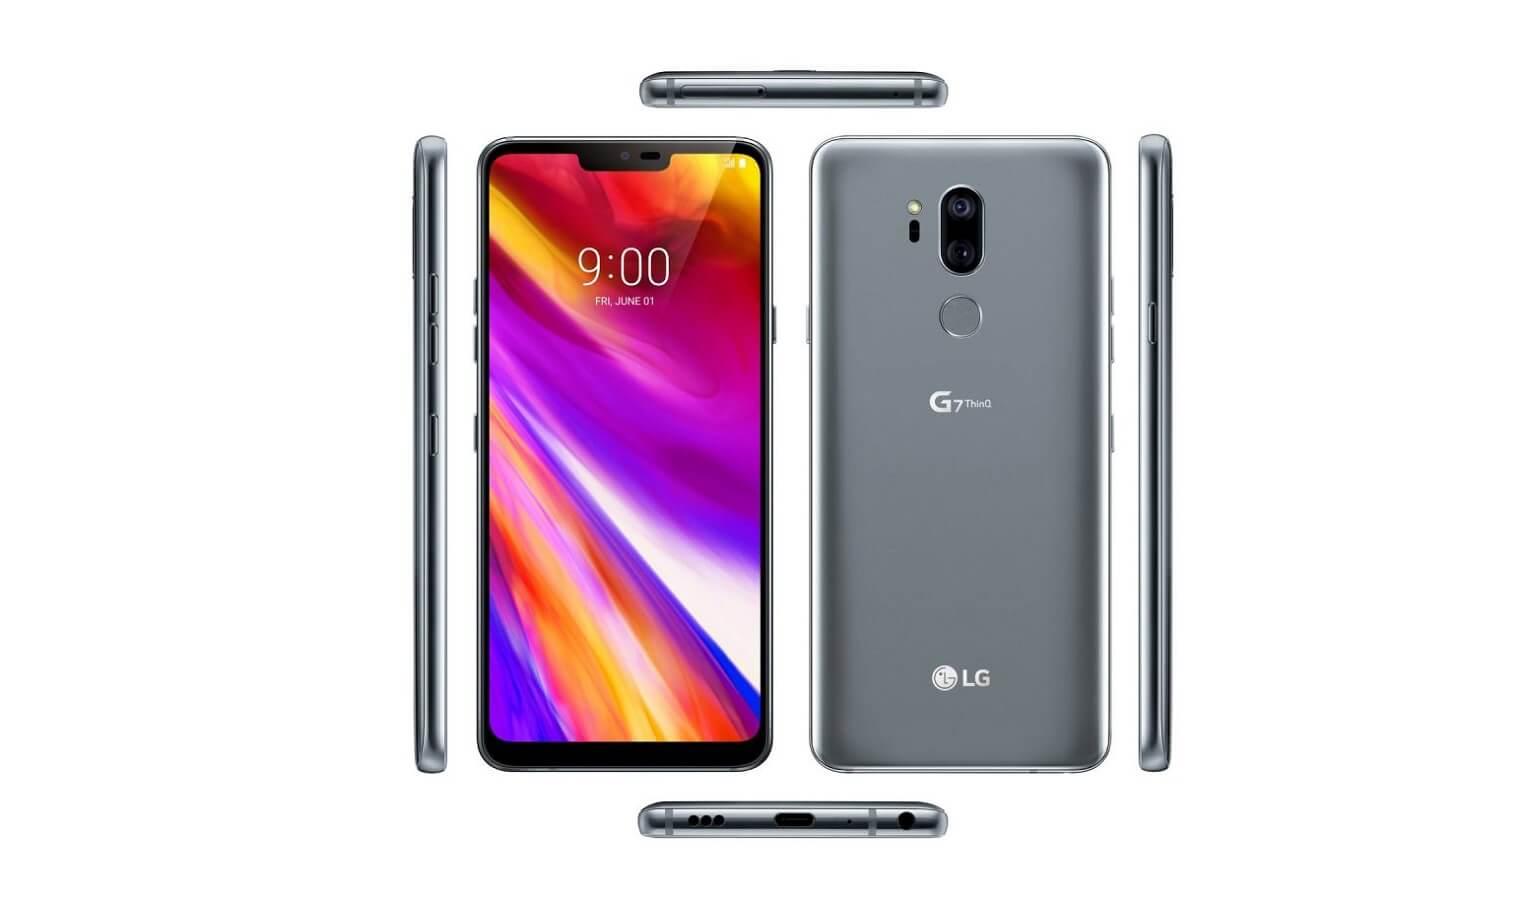 lg g7 thinq phone